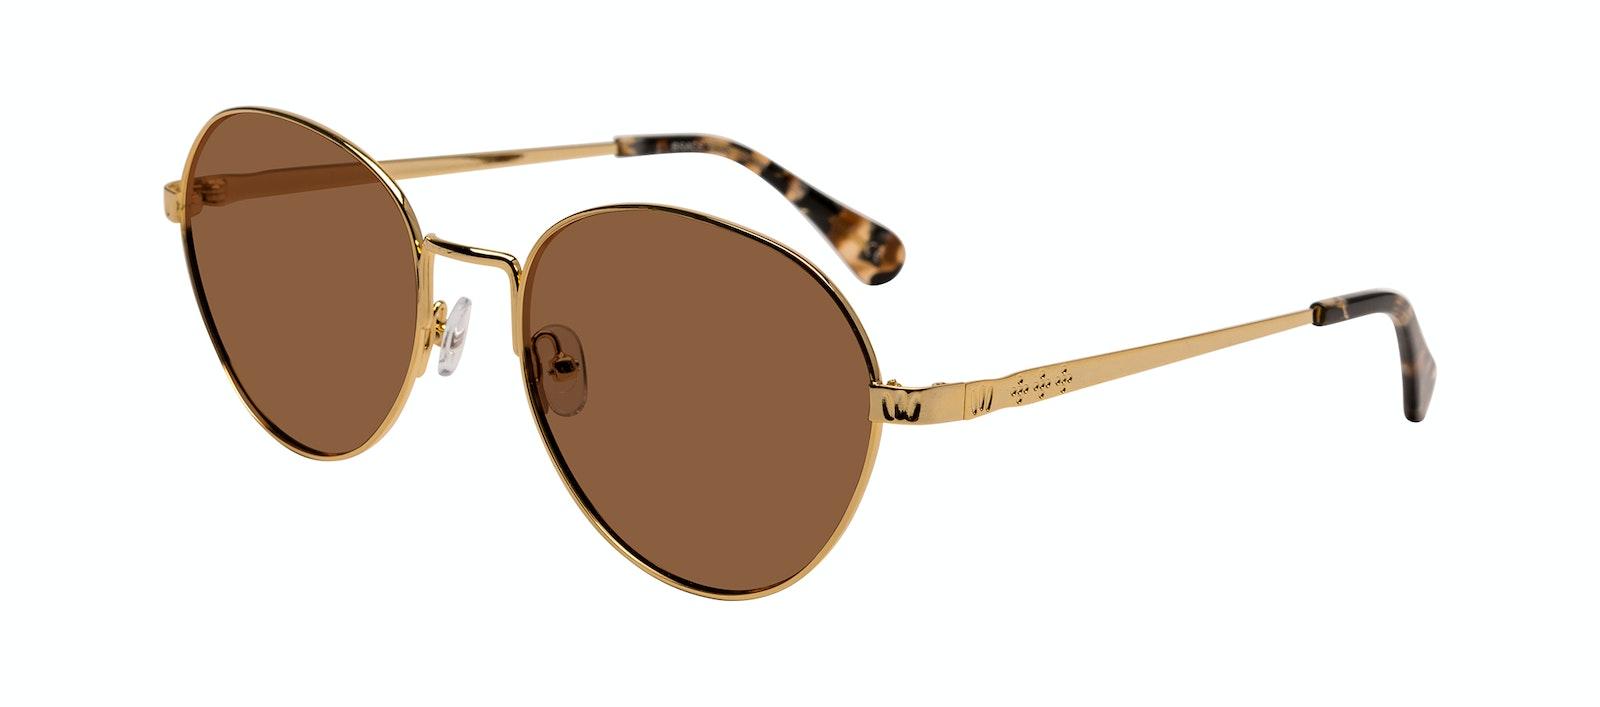 Affordable Fashion Glasses Round Sunglasses Women Brace Plus Gold Tilt